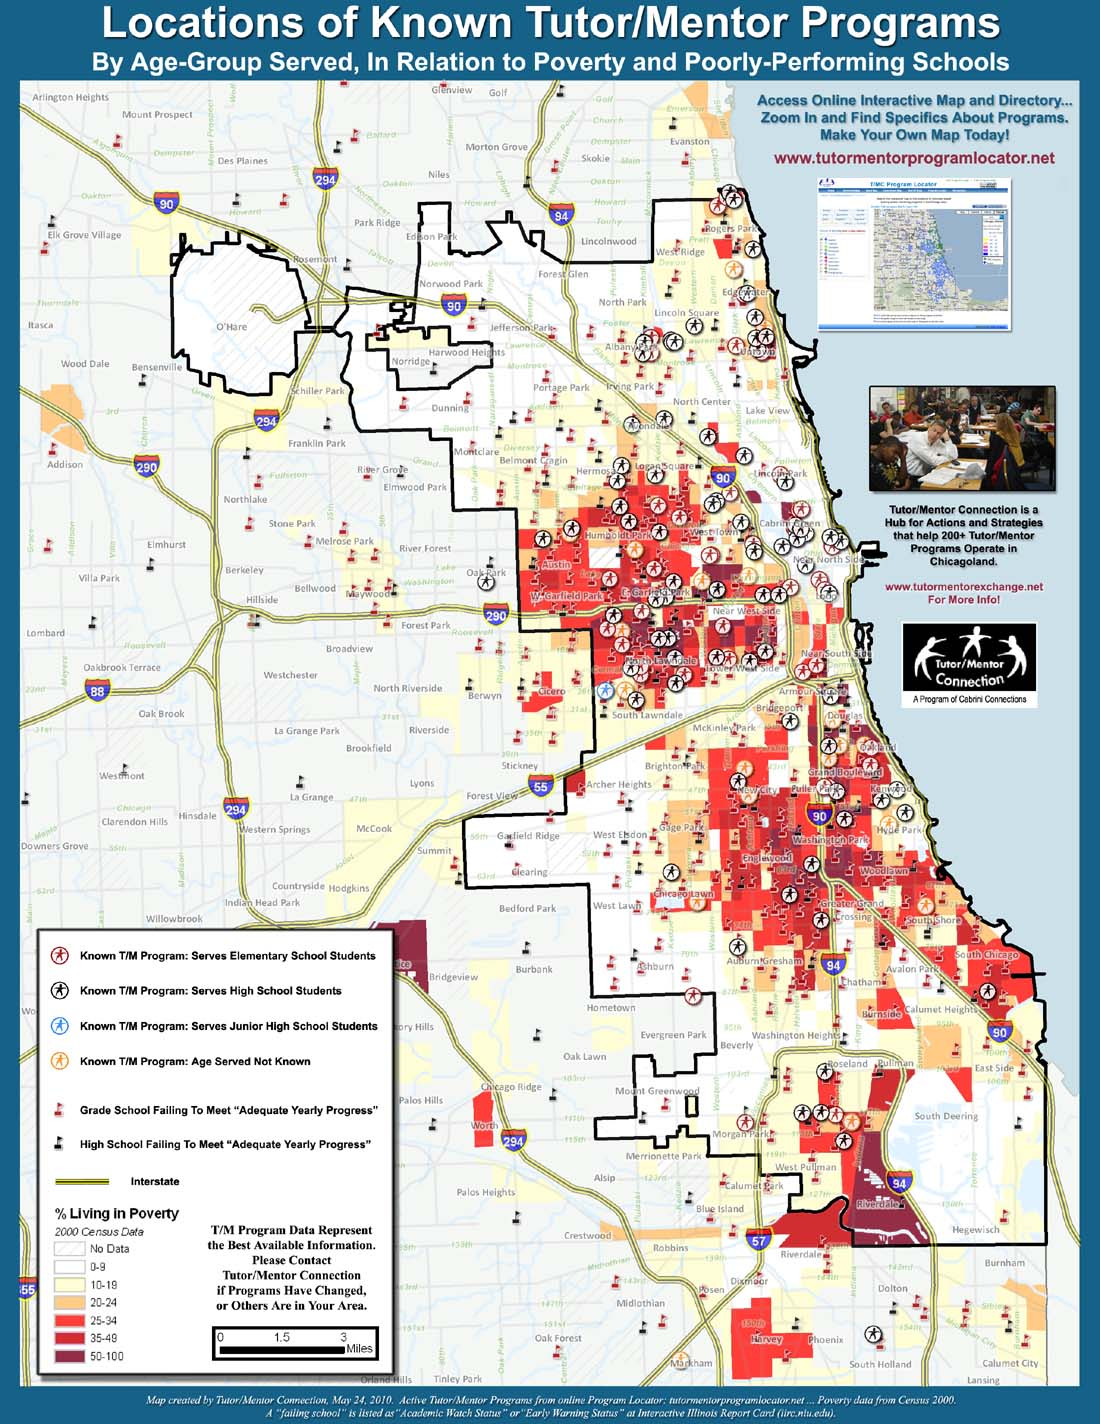 I Map Of Chicago on map of i 290 chicago, map of interstate 88 chicago, map of interstate 94 chicago, map of i 55 chicago,